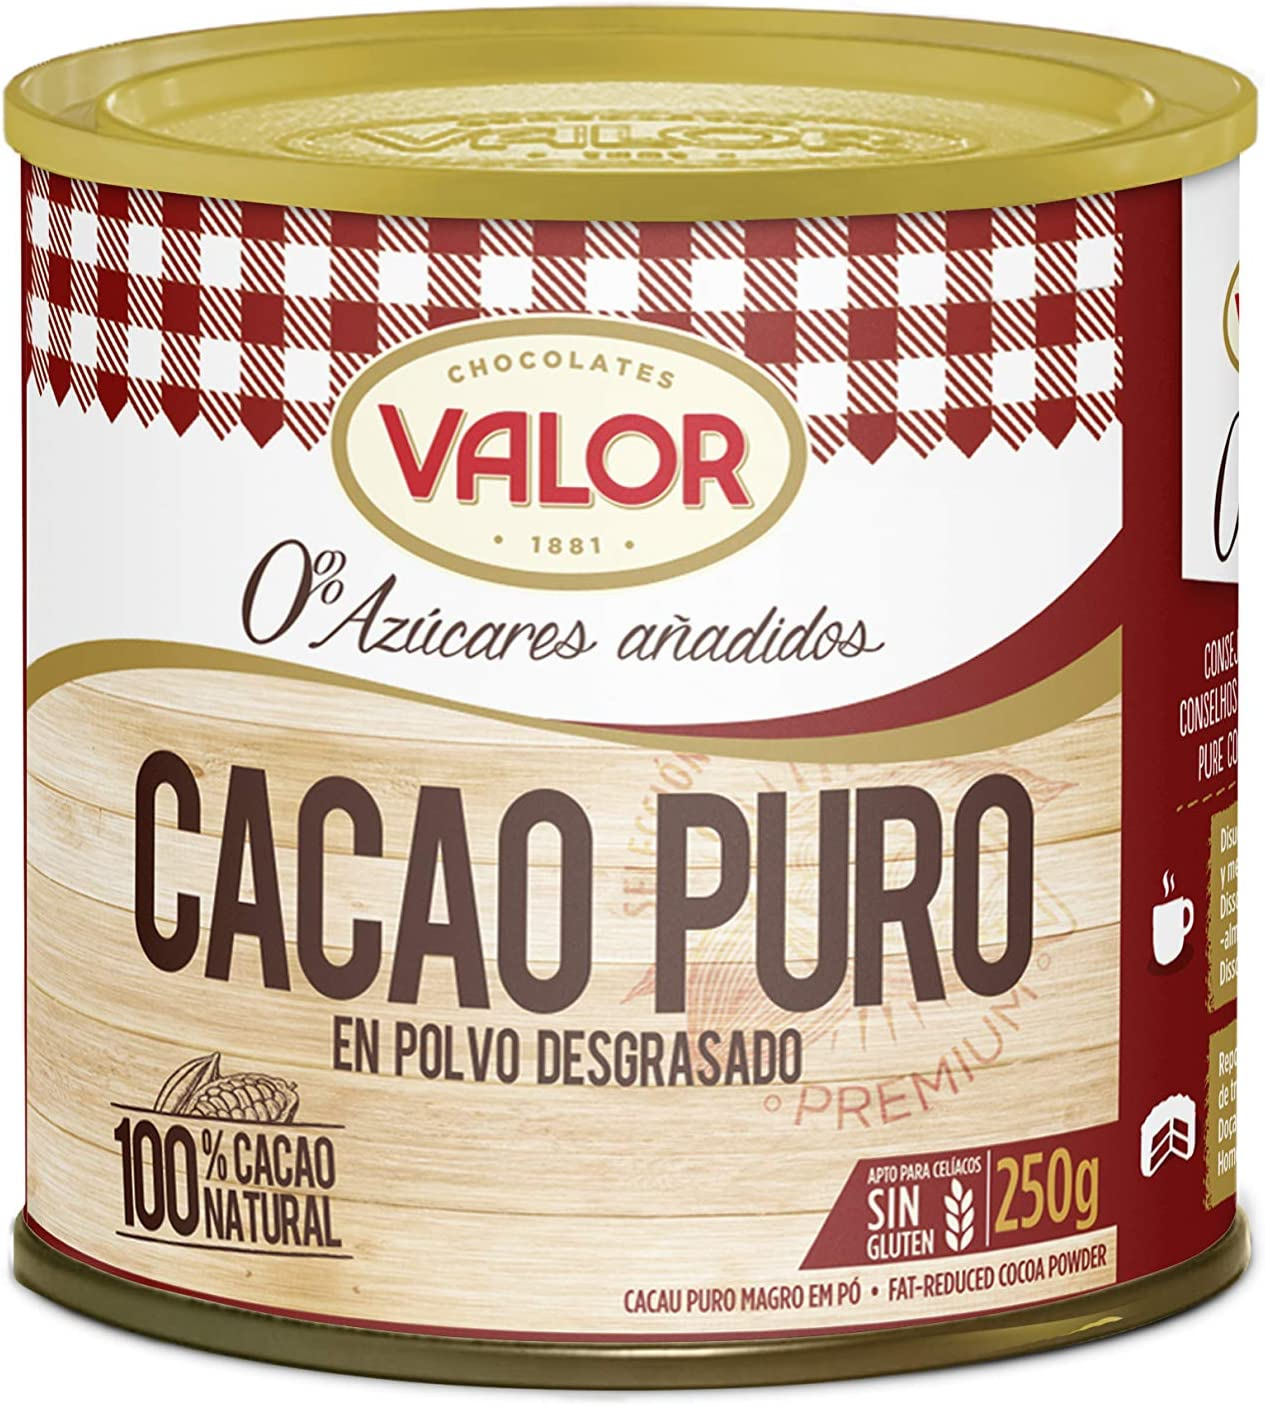 Chocolates Valor - Cacao Puro En Polvo Desgrasado - 250 g: Amazon ...